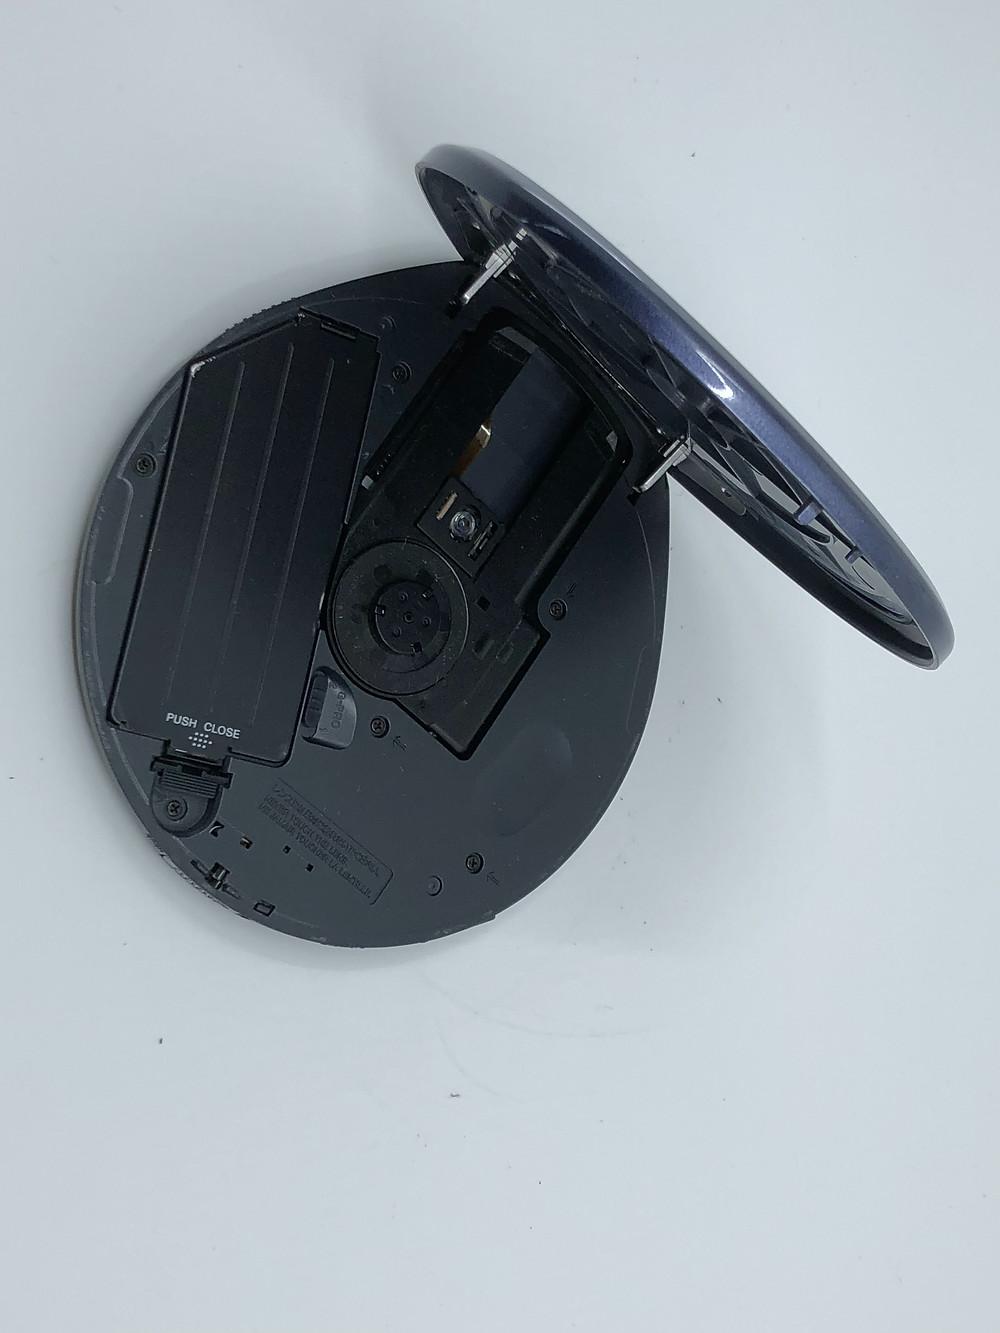 Sony CD Walkman D-EJ825 Portable CD Player